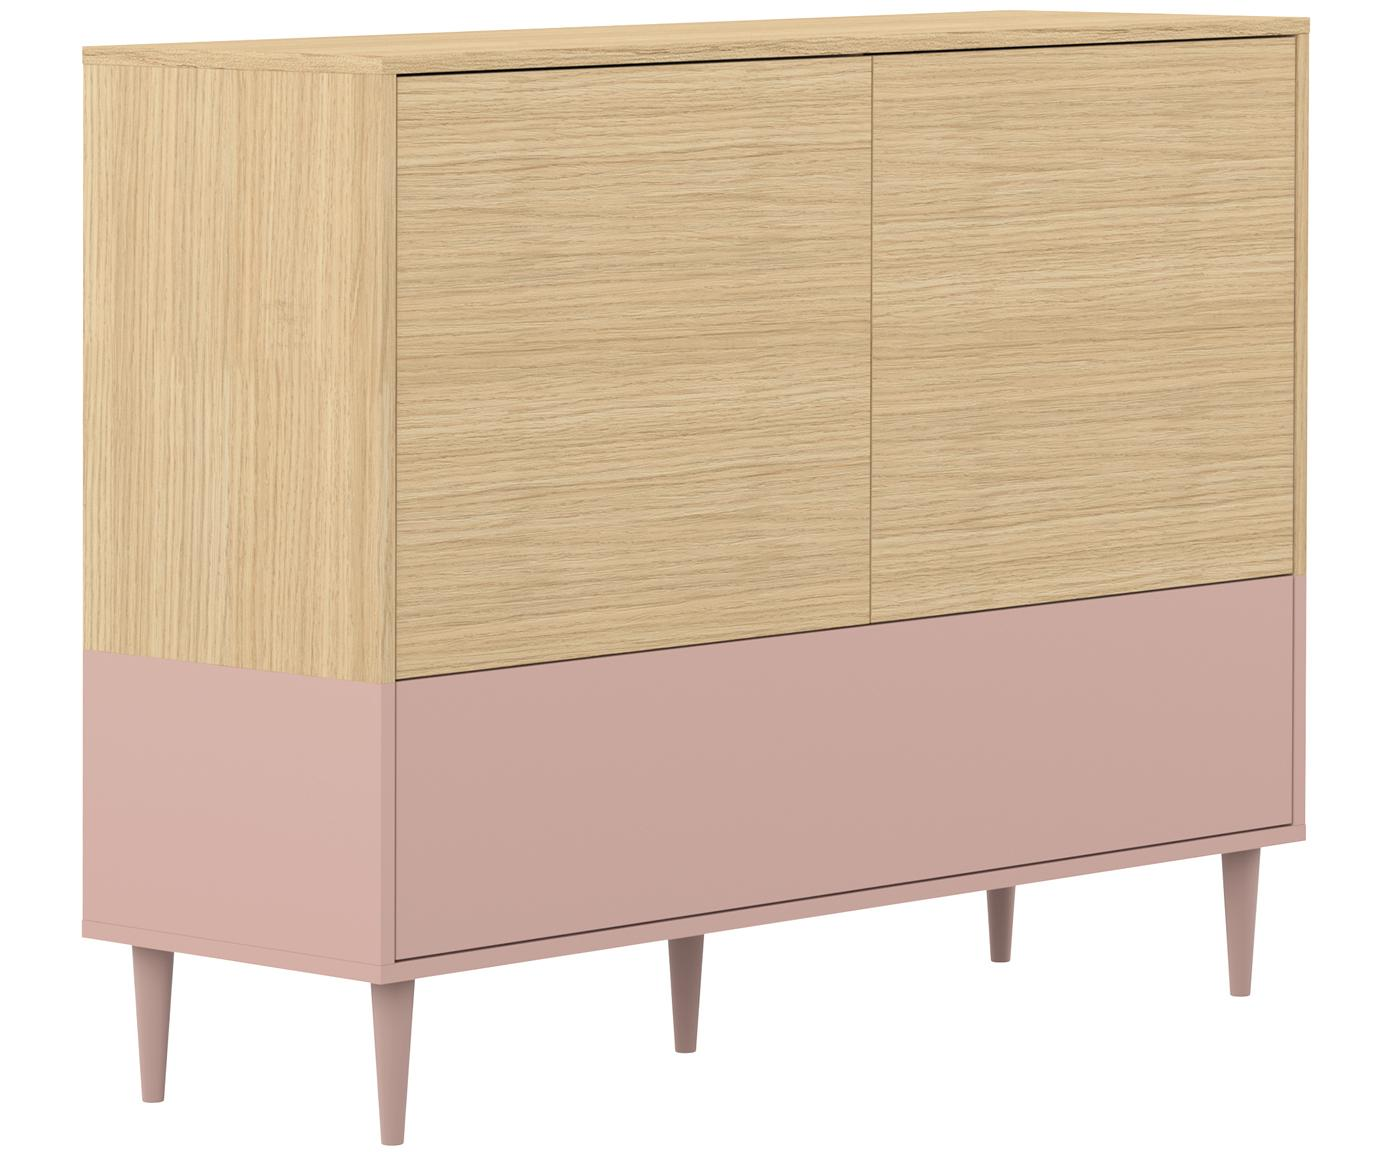 Sideboard Horizon im Skandi Design, Korpus: Spanplatte, melaminbeschi, Füße: Buchenholz, massiv, lacki, Eichenholz, Altrosa, 120 x 95 cm